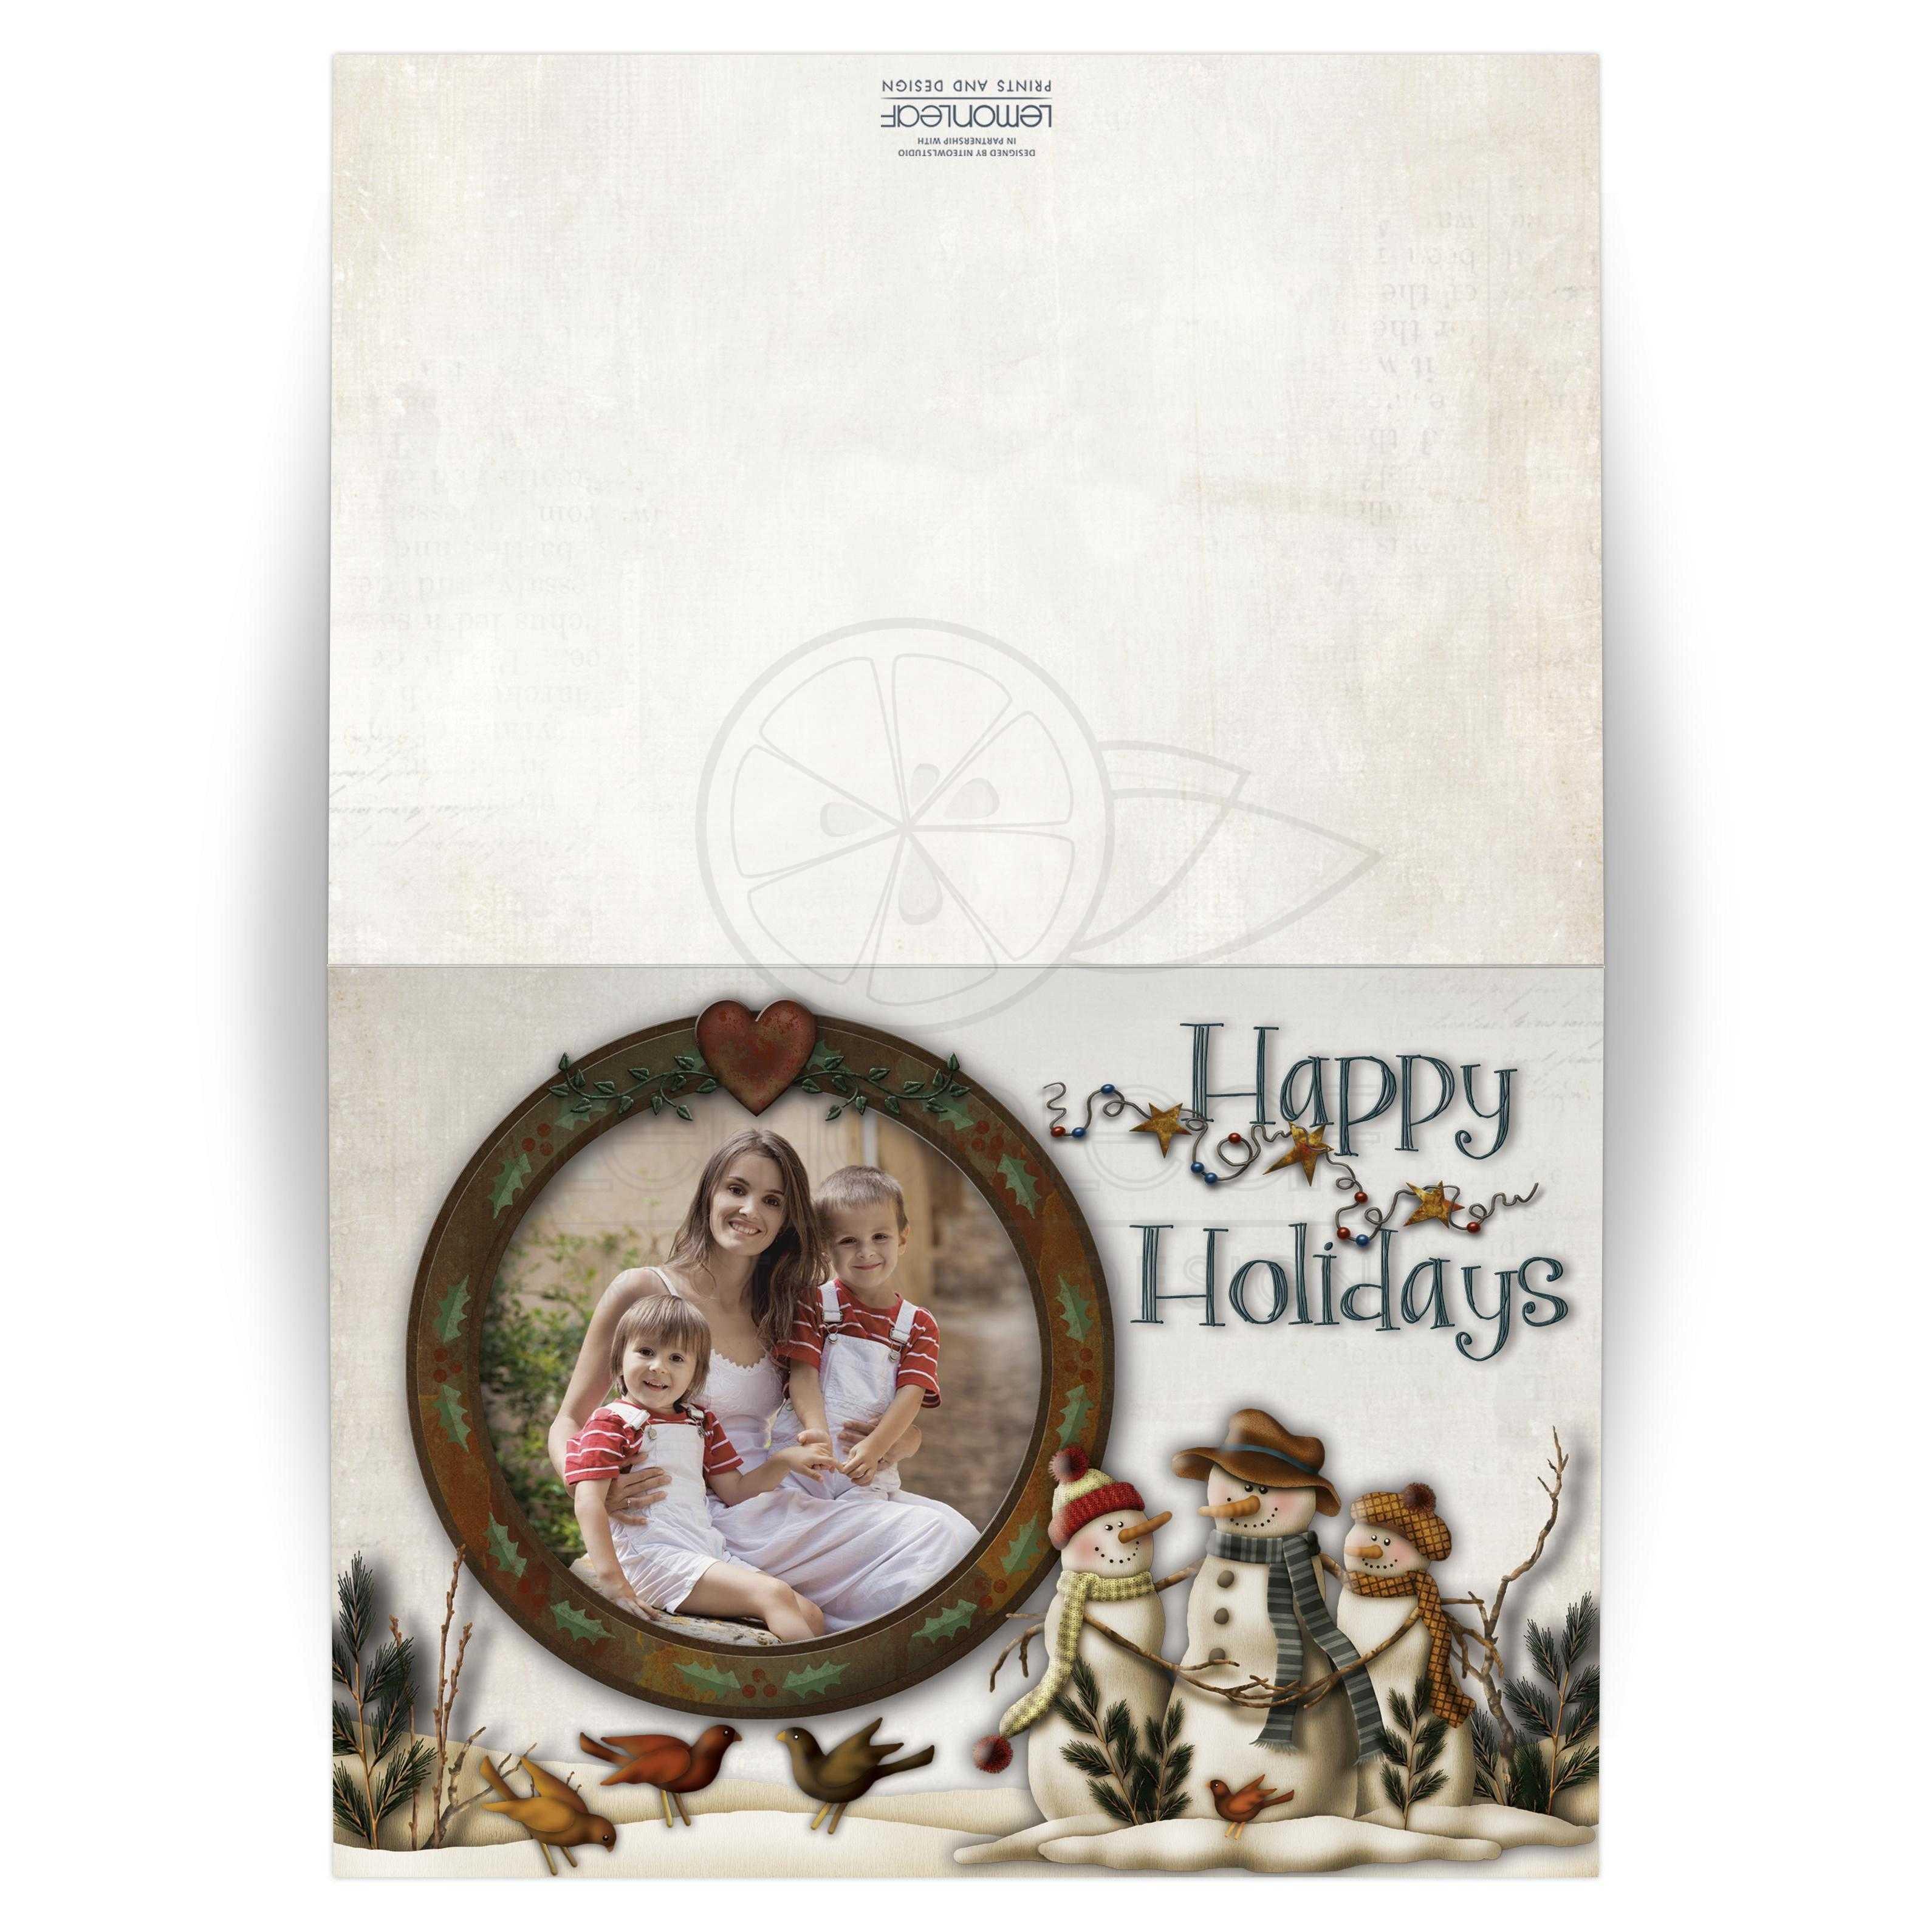 Folded 5x7 christmas or holiday card 2 personalized for Best personalized christmas cards